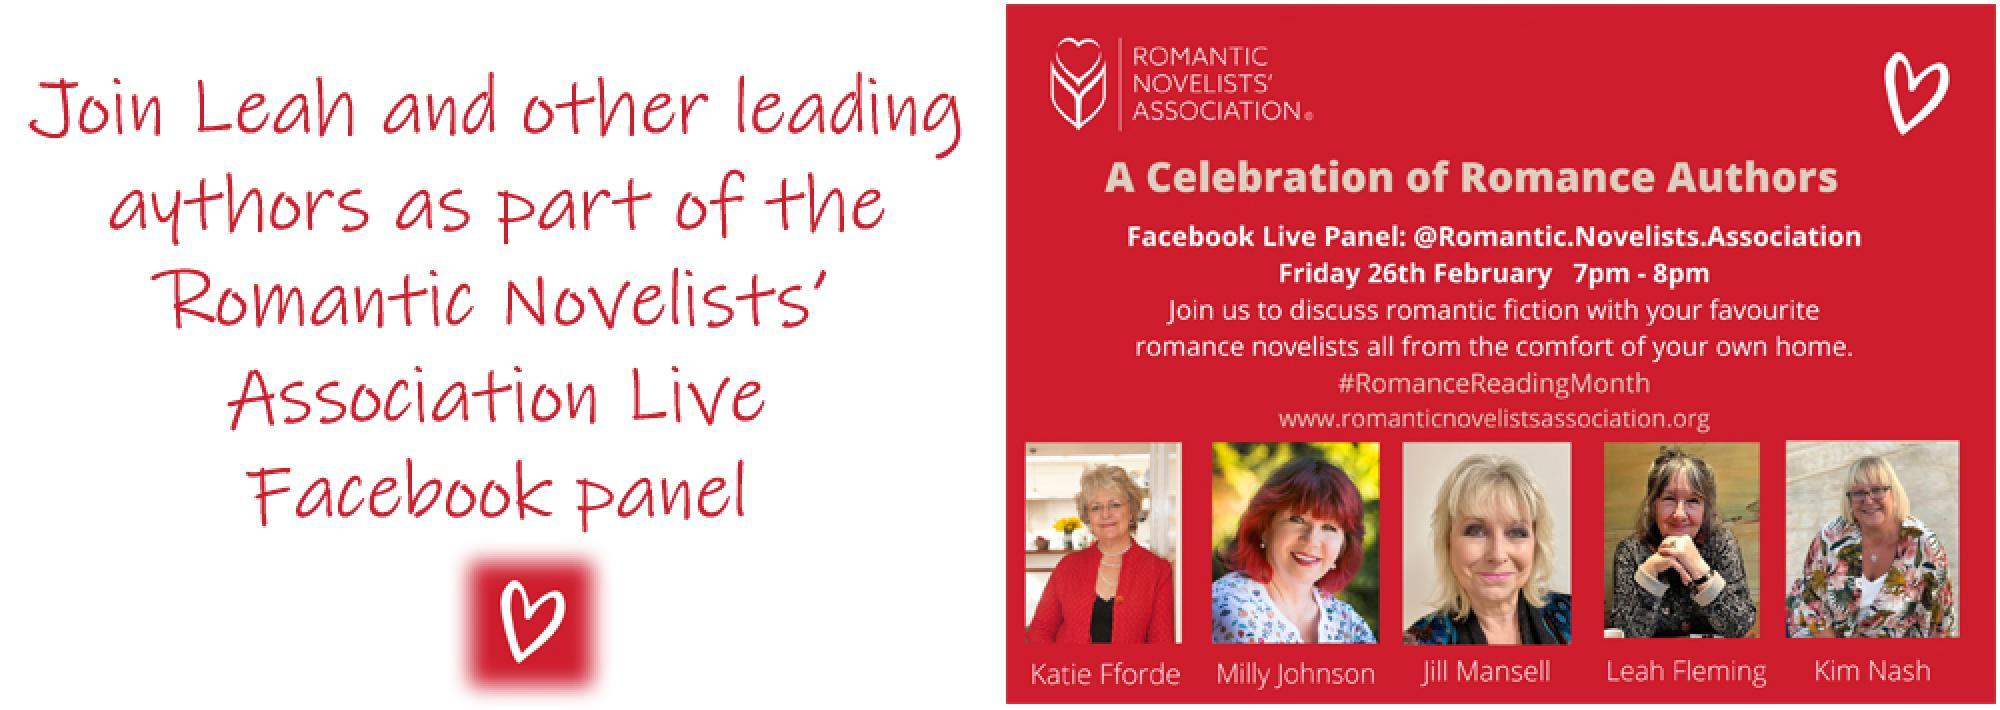 https://www.facebook.com/Romantic.Novelists.Association